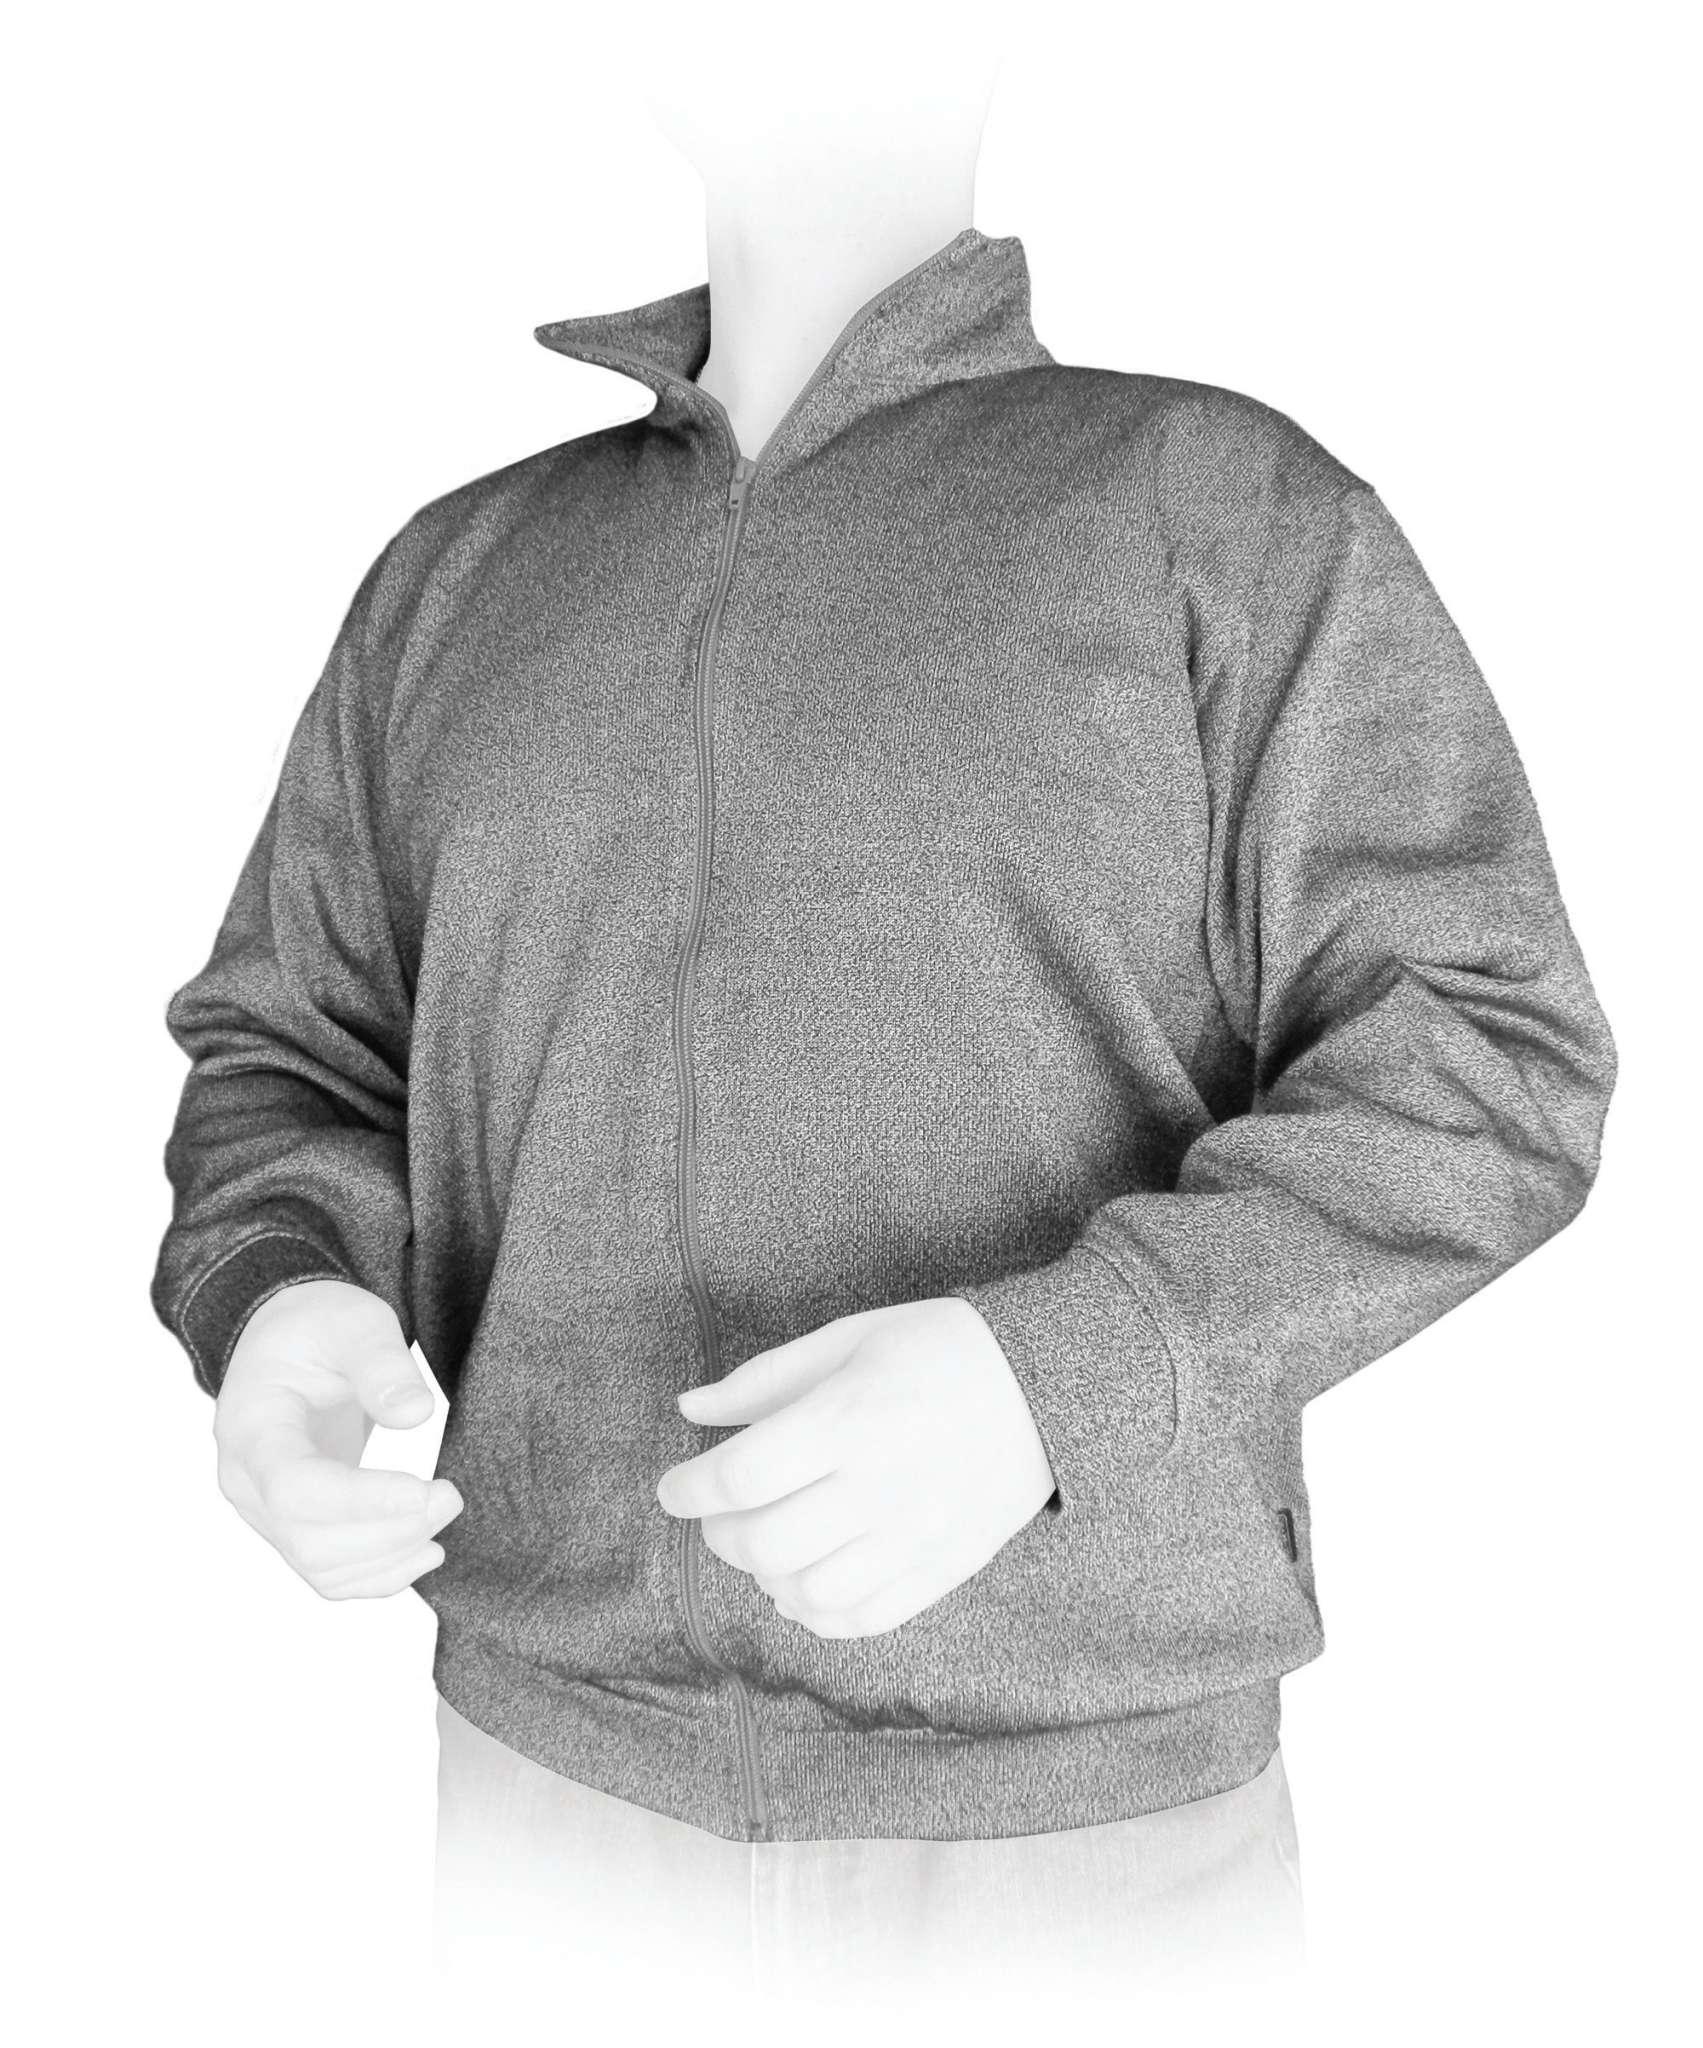 PPSS Cut-Tex®PRO立领护颈卫衣丨防刀割卫衣丨防刀衣丨防砍服丨防砍衣丨PotentWear